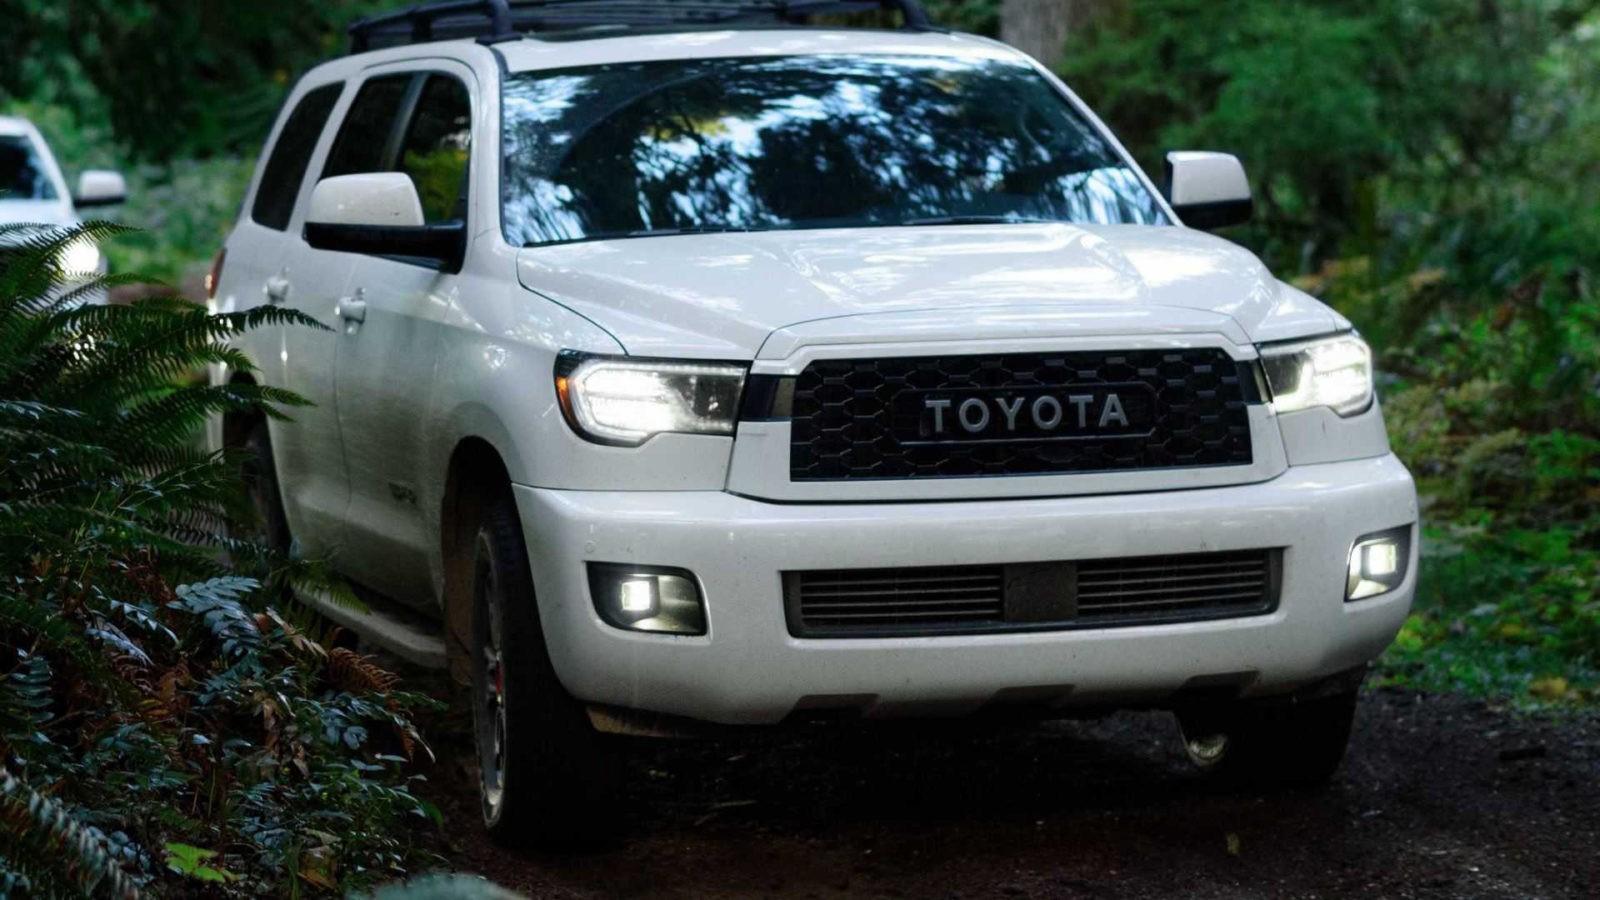 2020 Toyota Sequoia TRD Pro foto, jekster'er, vid speredi, tehnicheskie harakteristiki, cena, data vyhoda — video